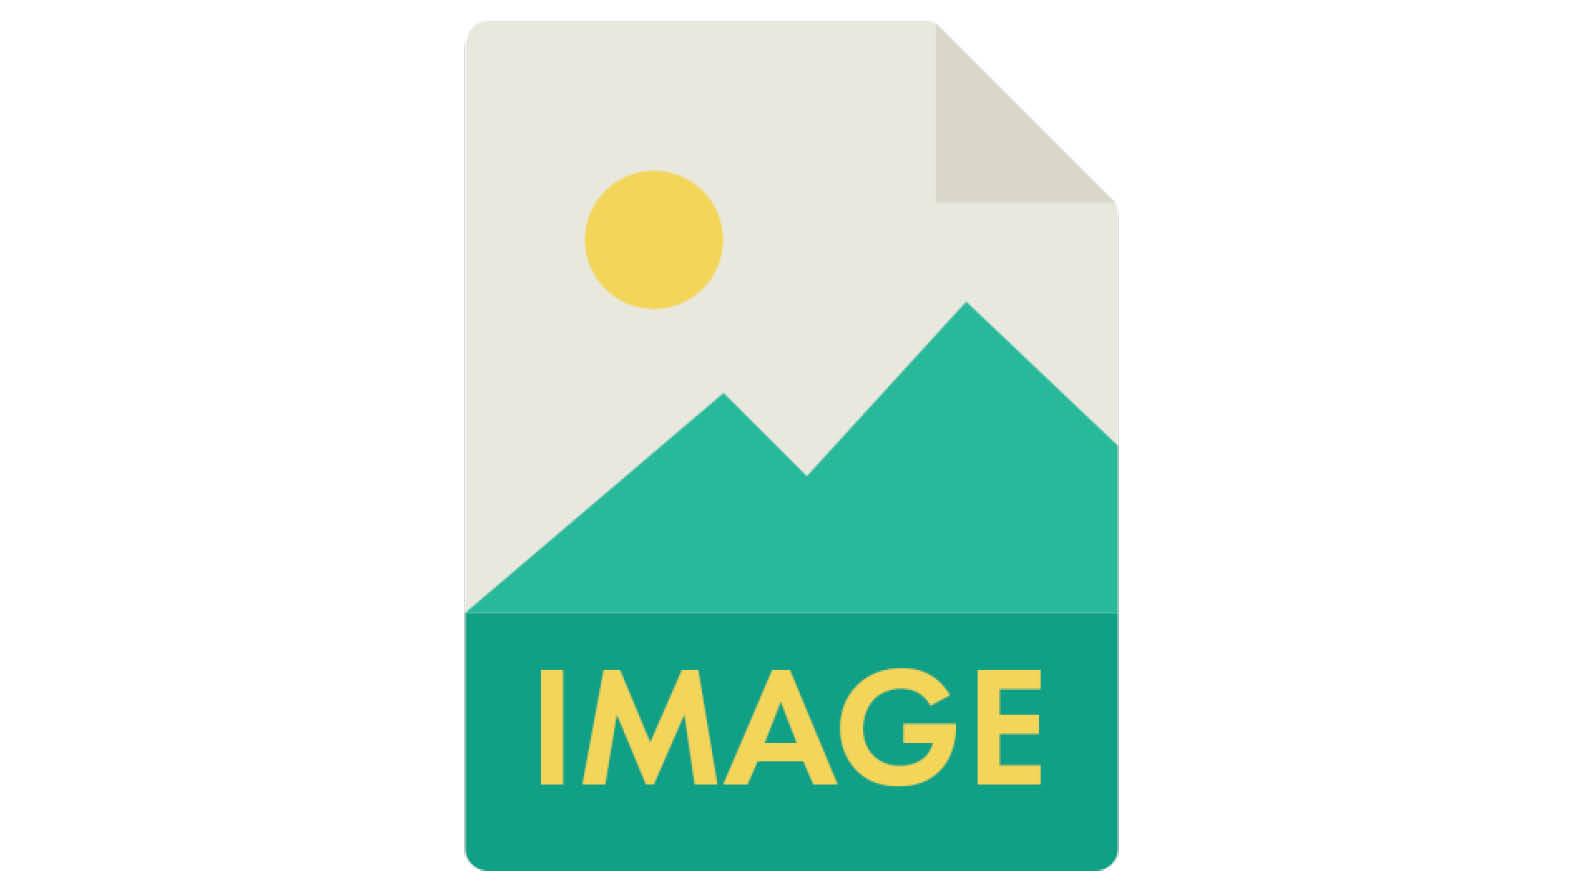 web icon image